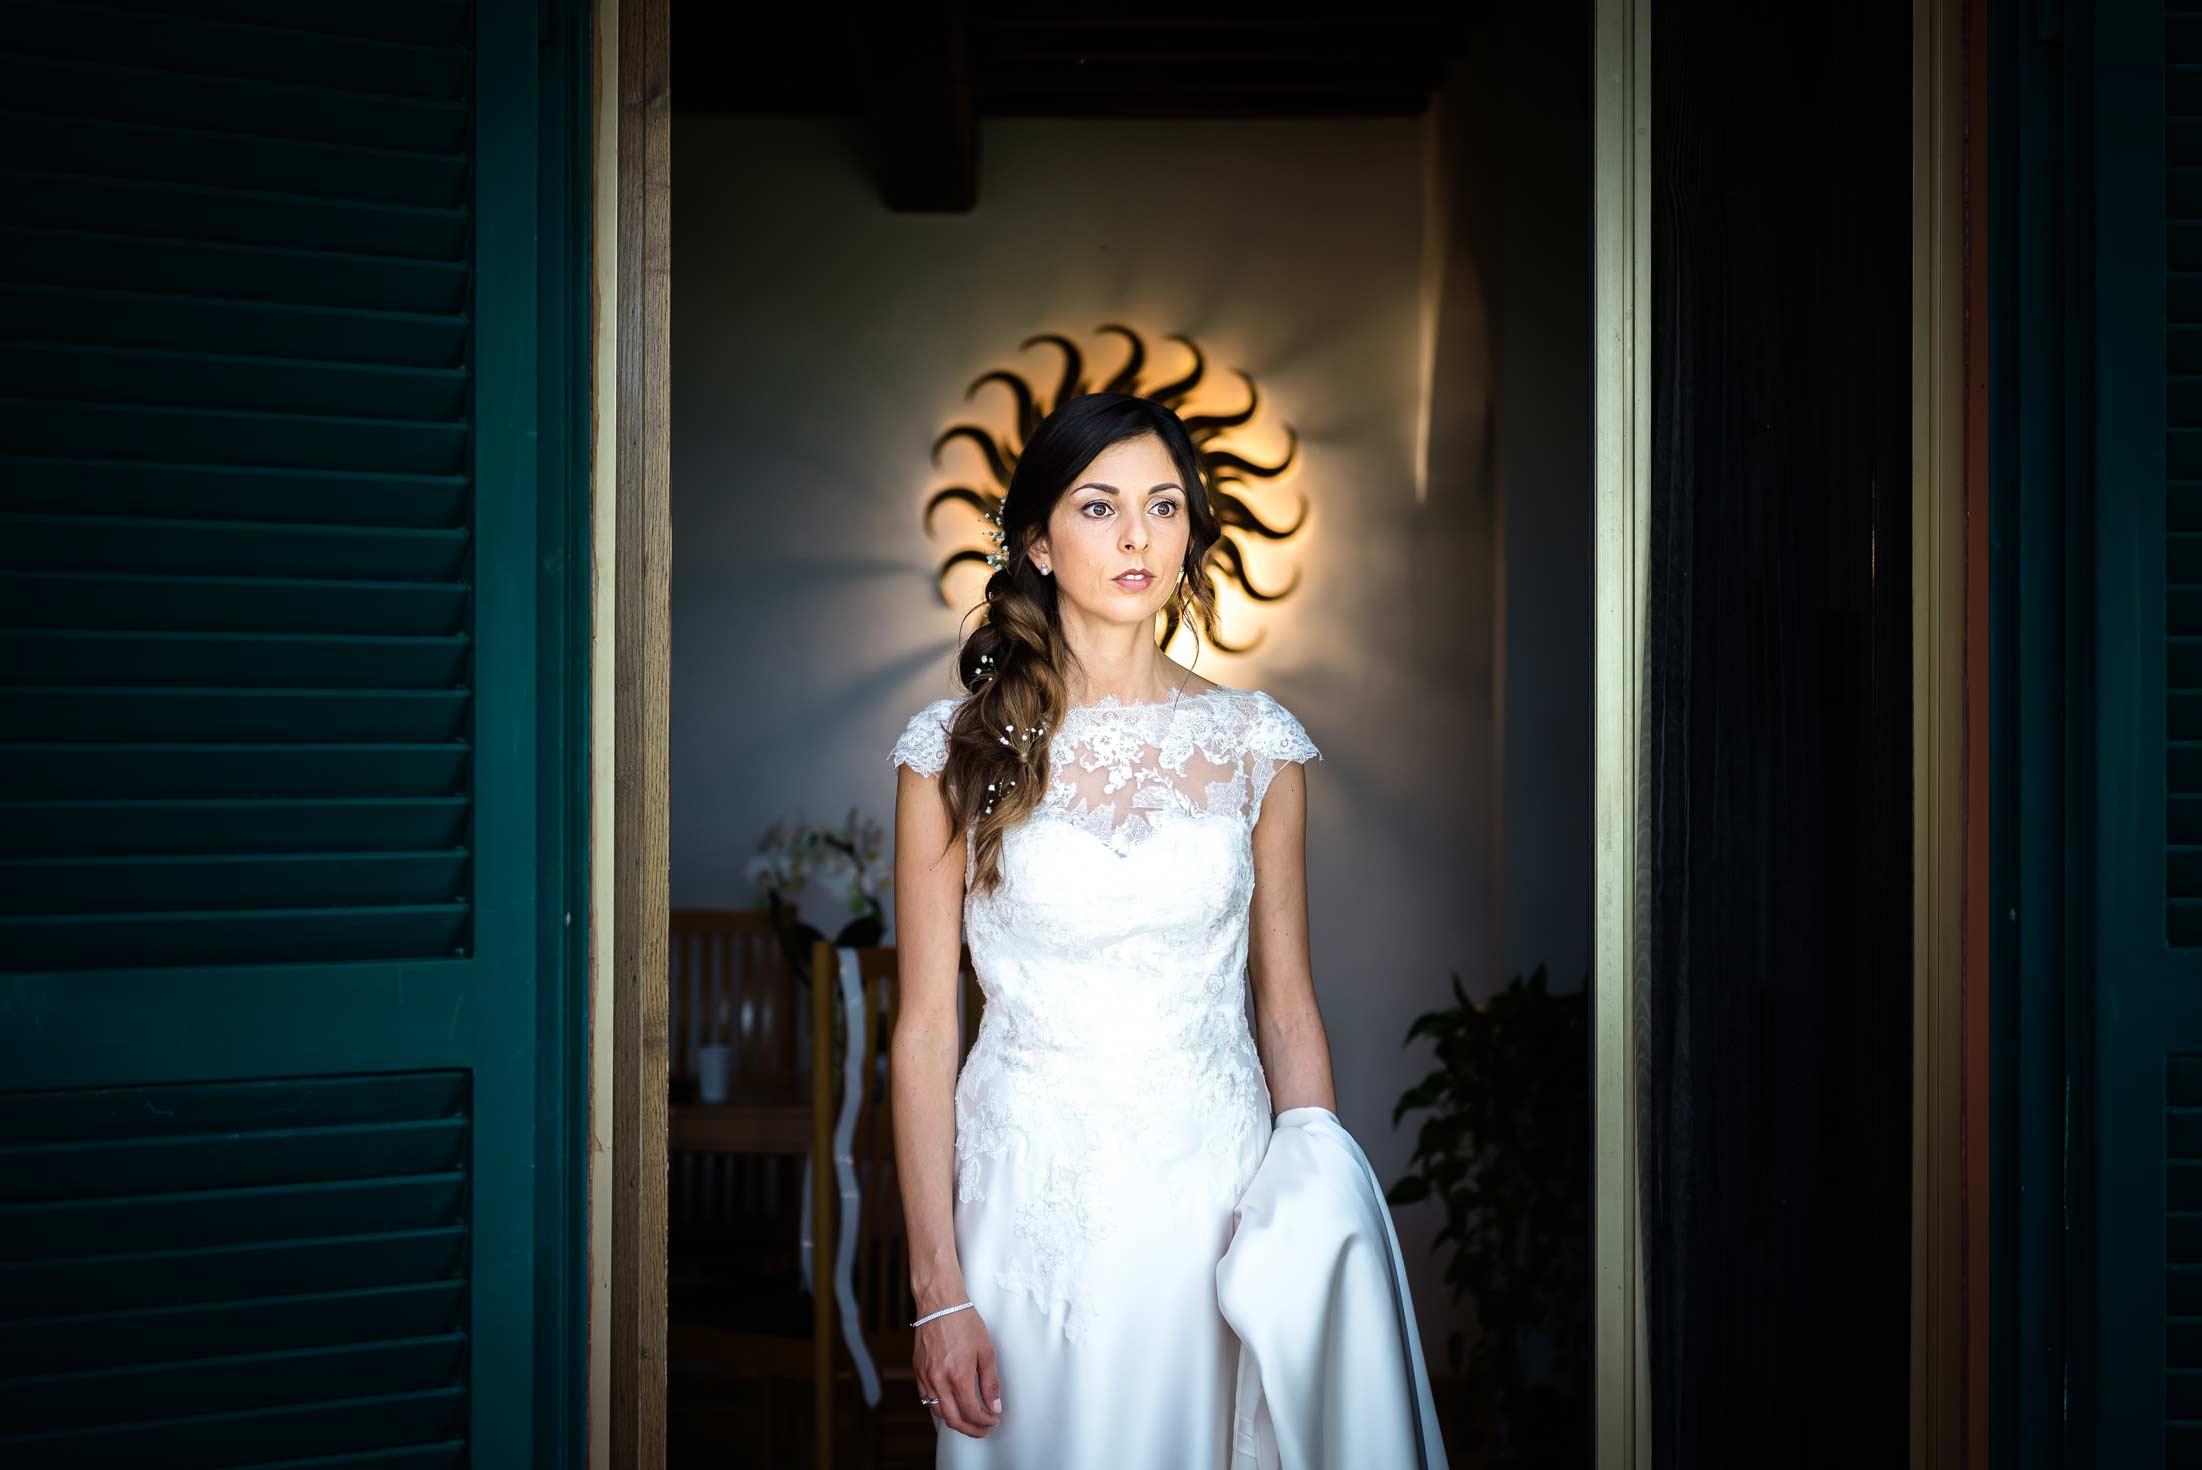 Matrimonio-Fotografo-Roma-Reportage-Preparativi-Sposa